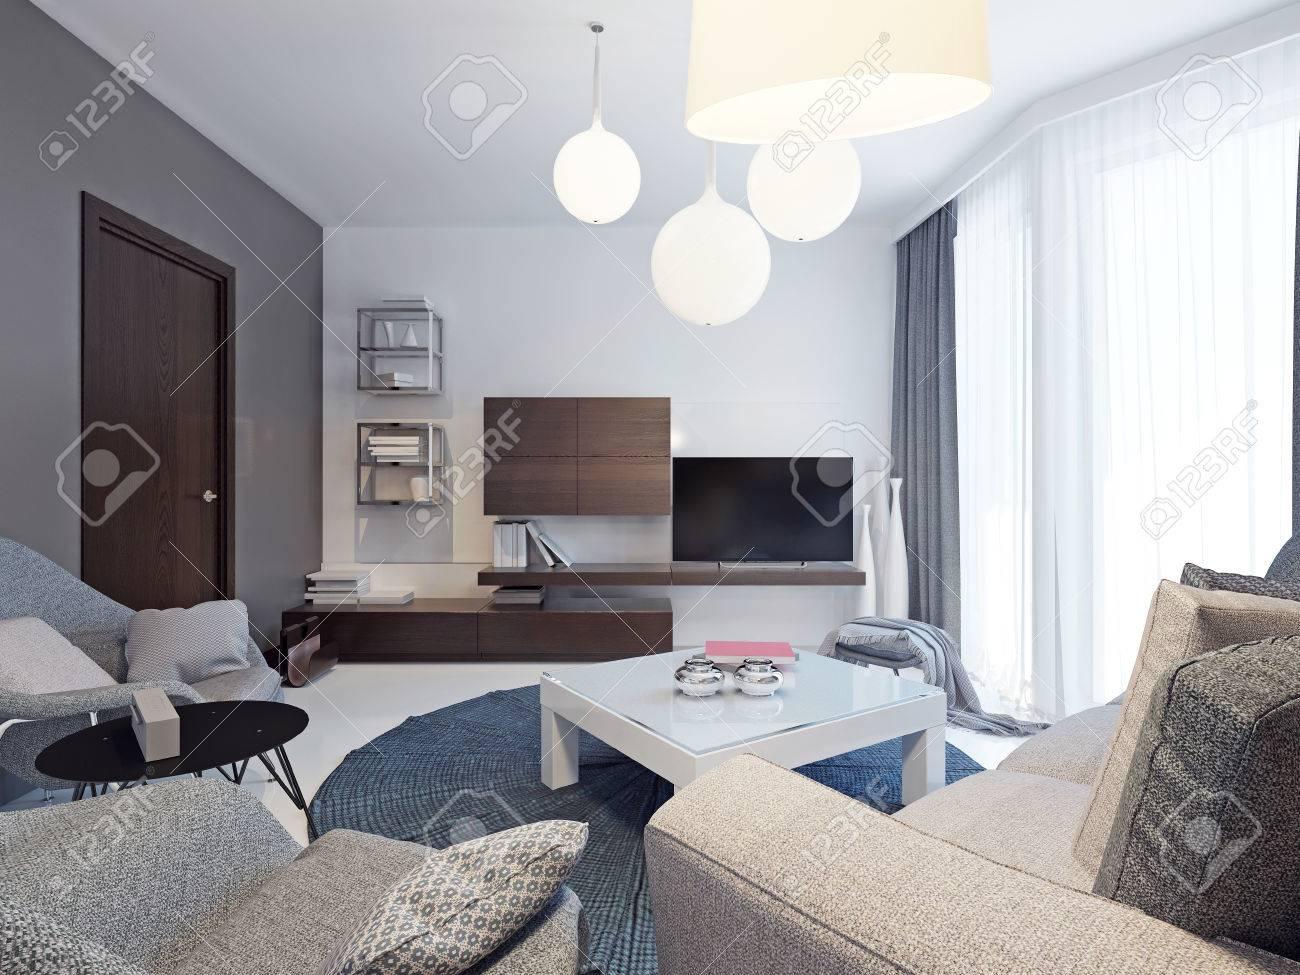 Minimalist Living Room Interior. Beautiful Bright Room With Colorful  Original Form Walls, Floor To